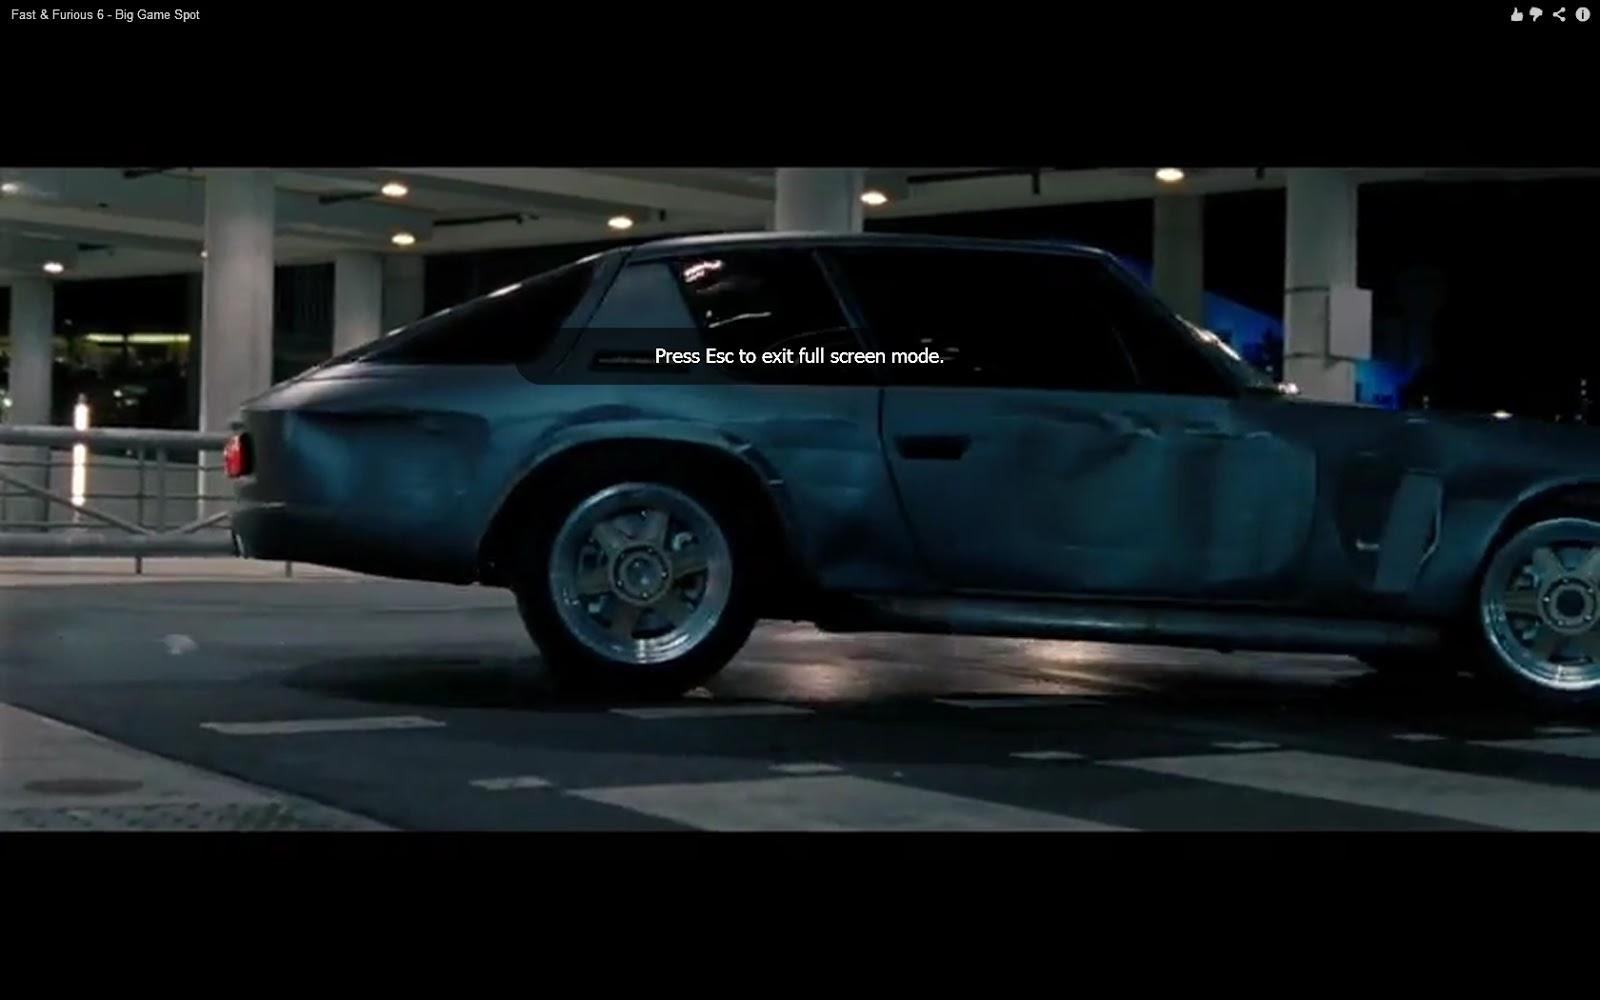 Jensen Interceptor in Fast & Furious 6 Trailer?